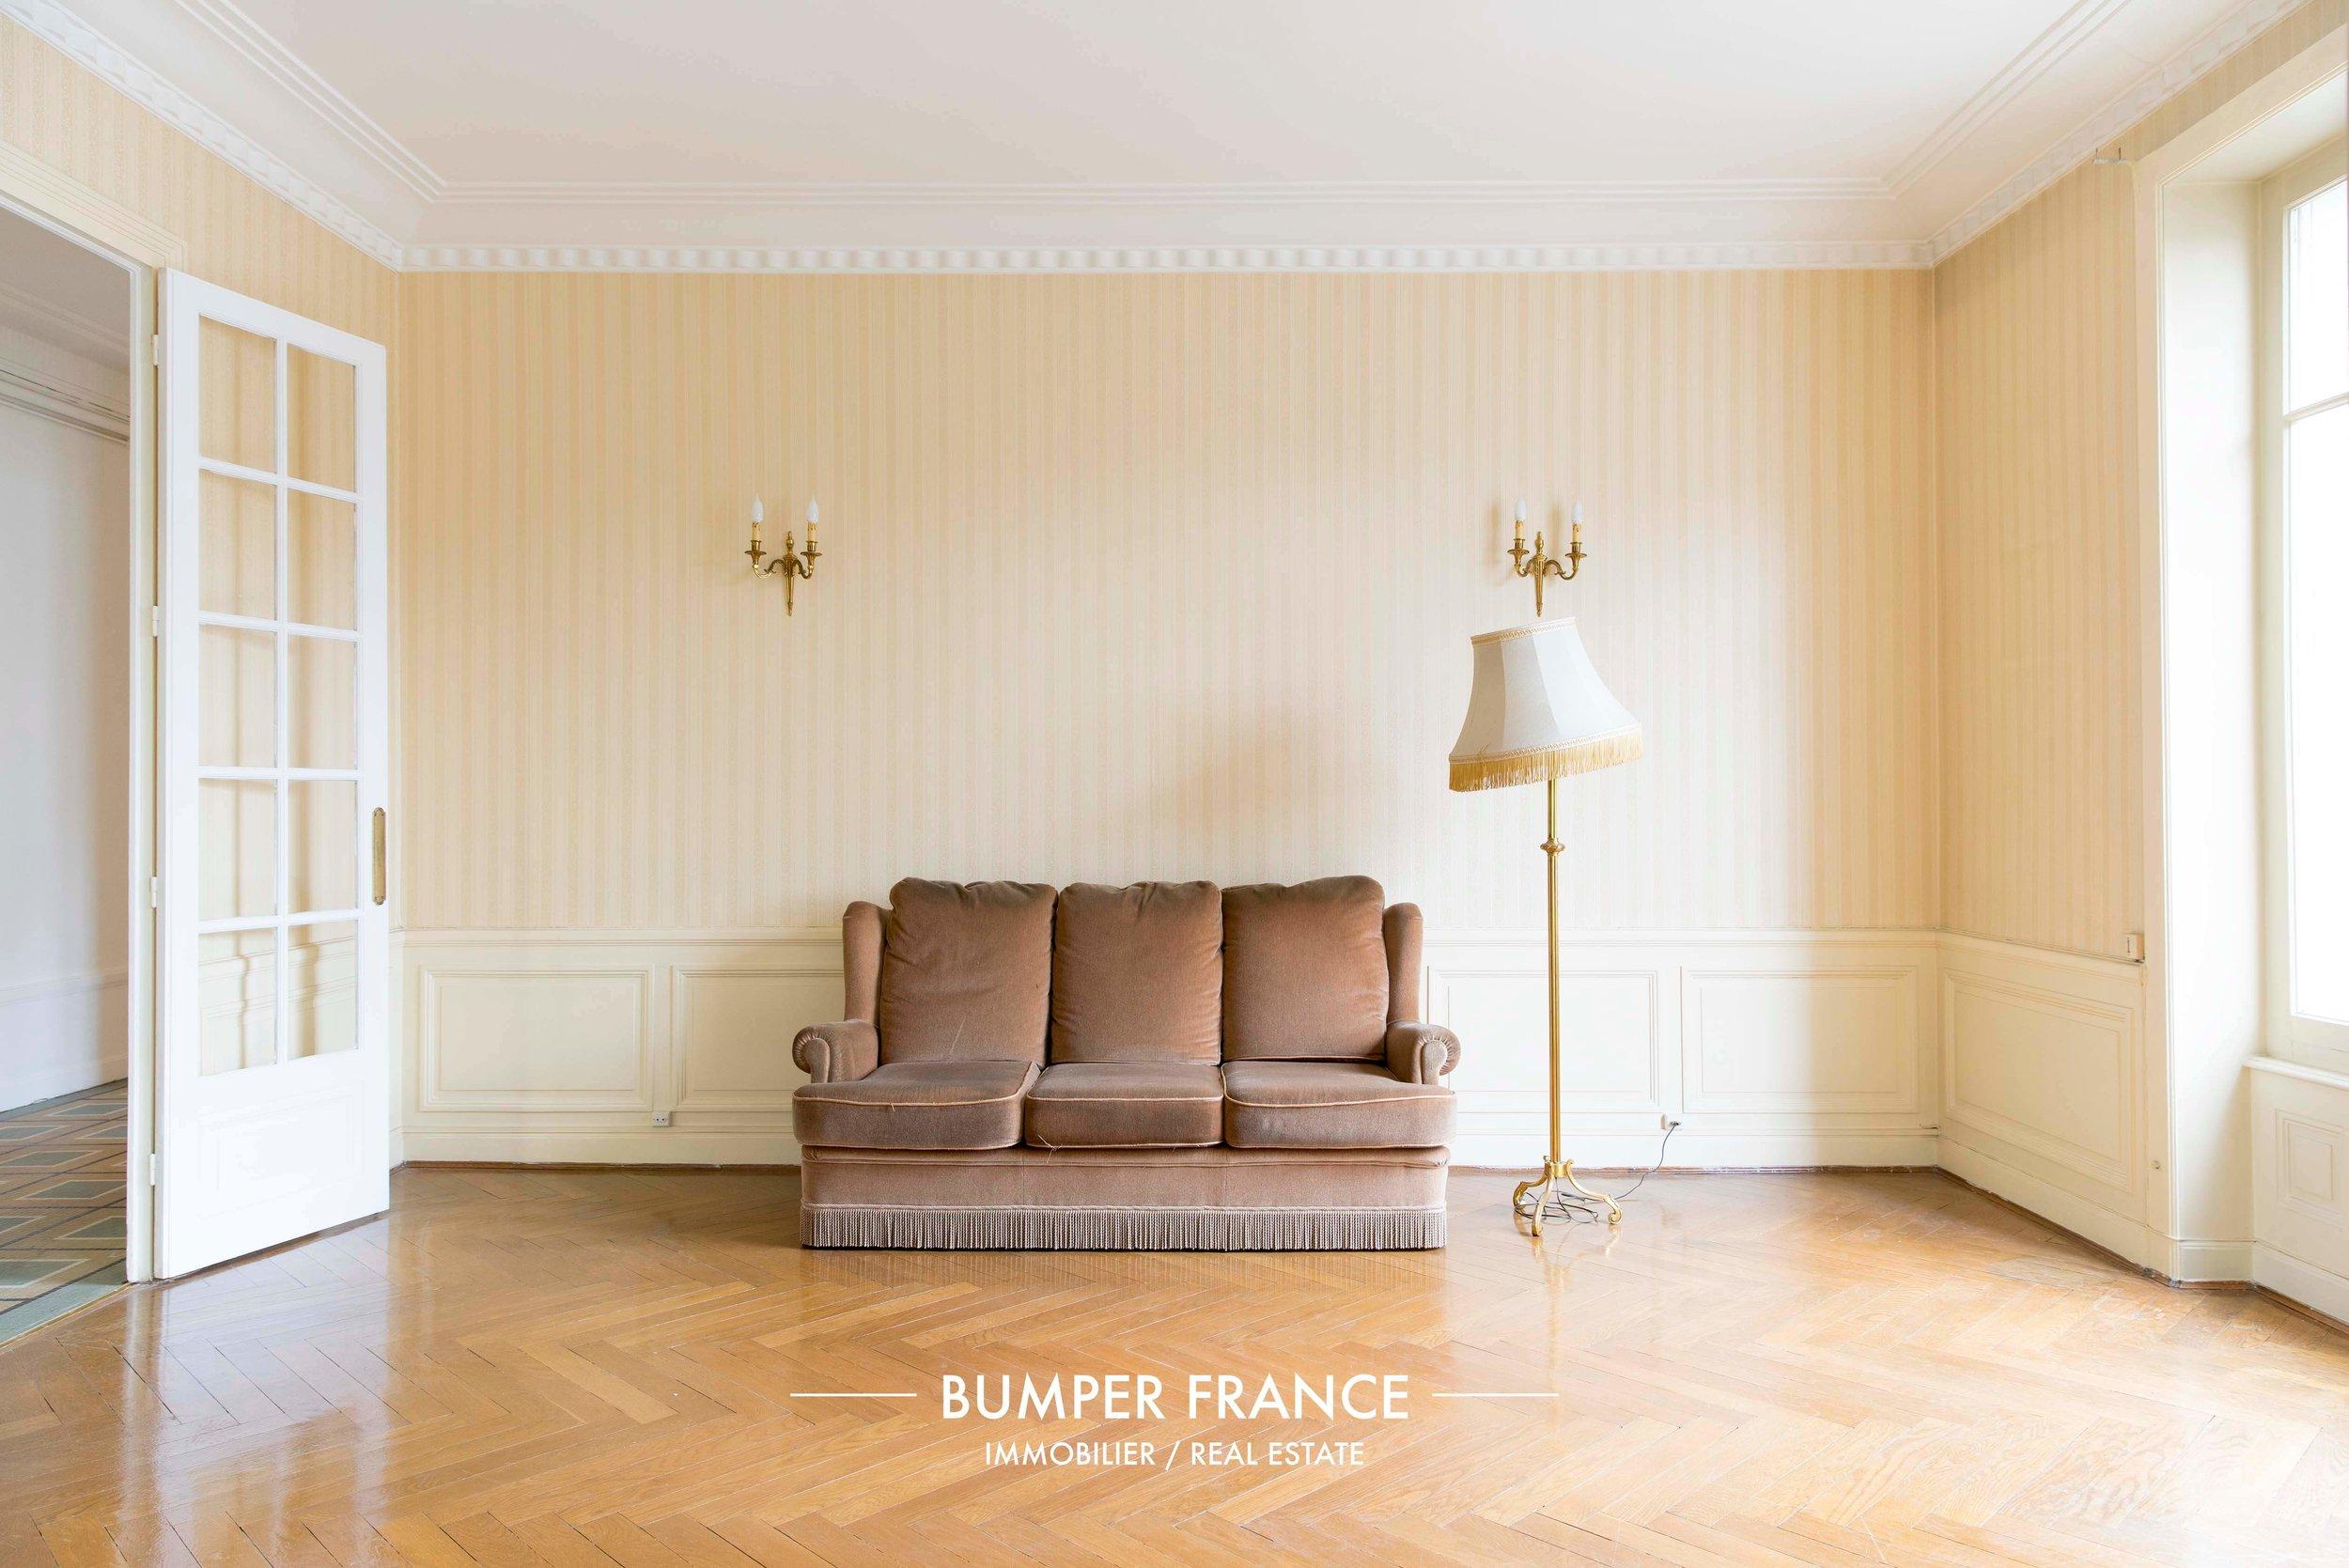 bumper-vendu-appartement-maison-immobilier17.jpg